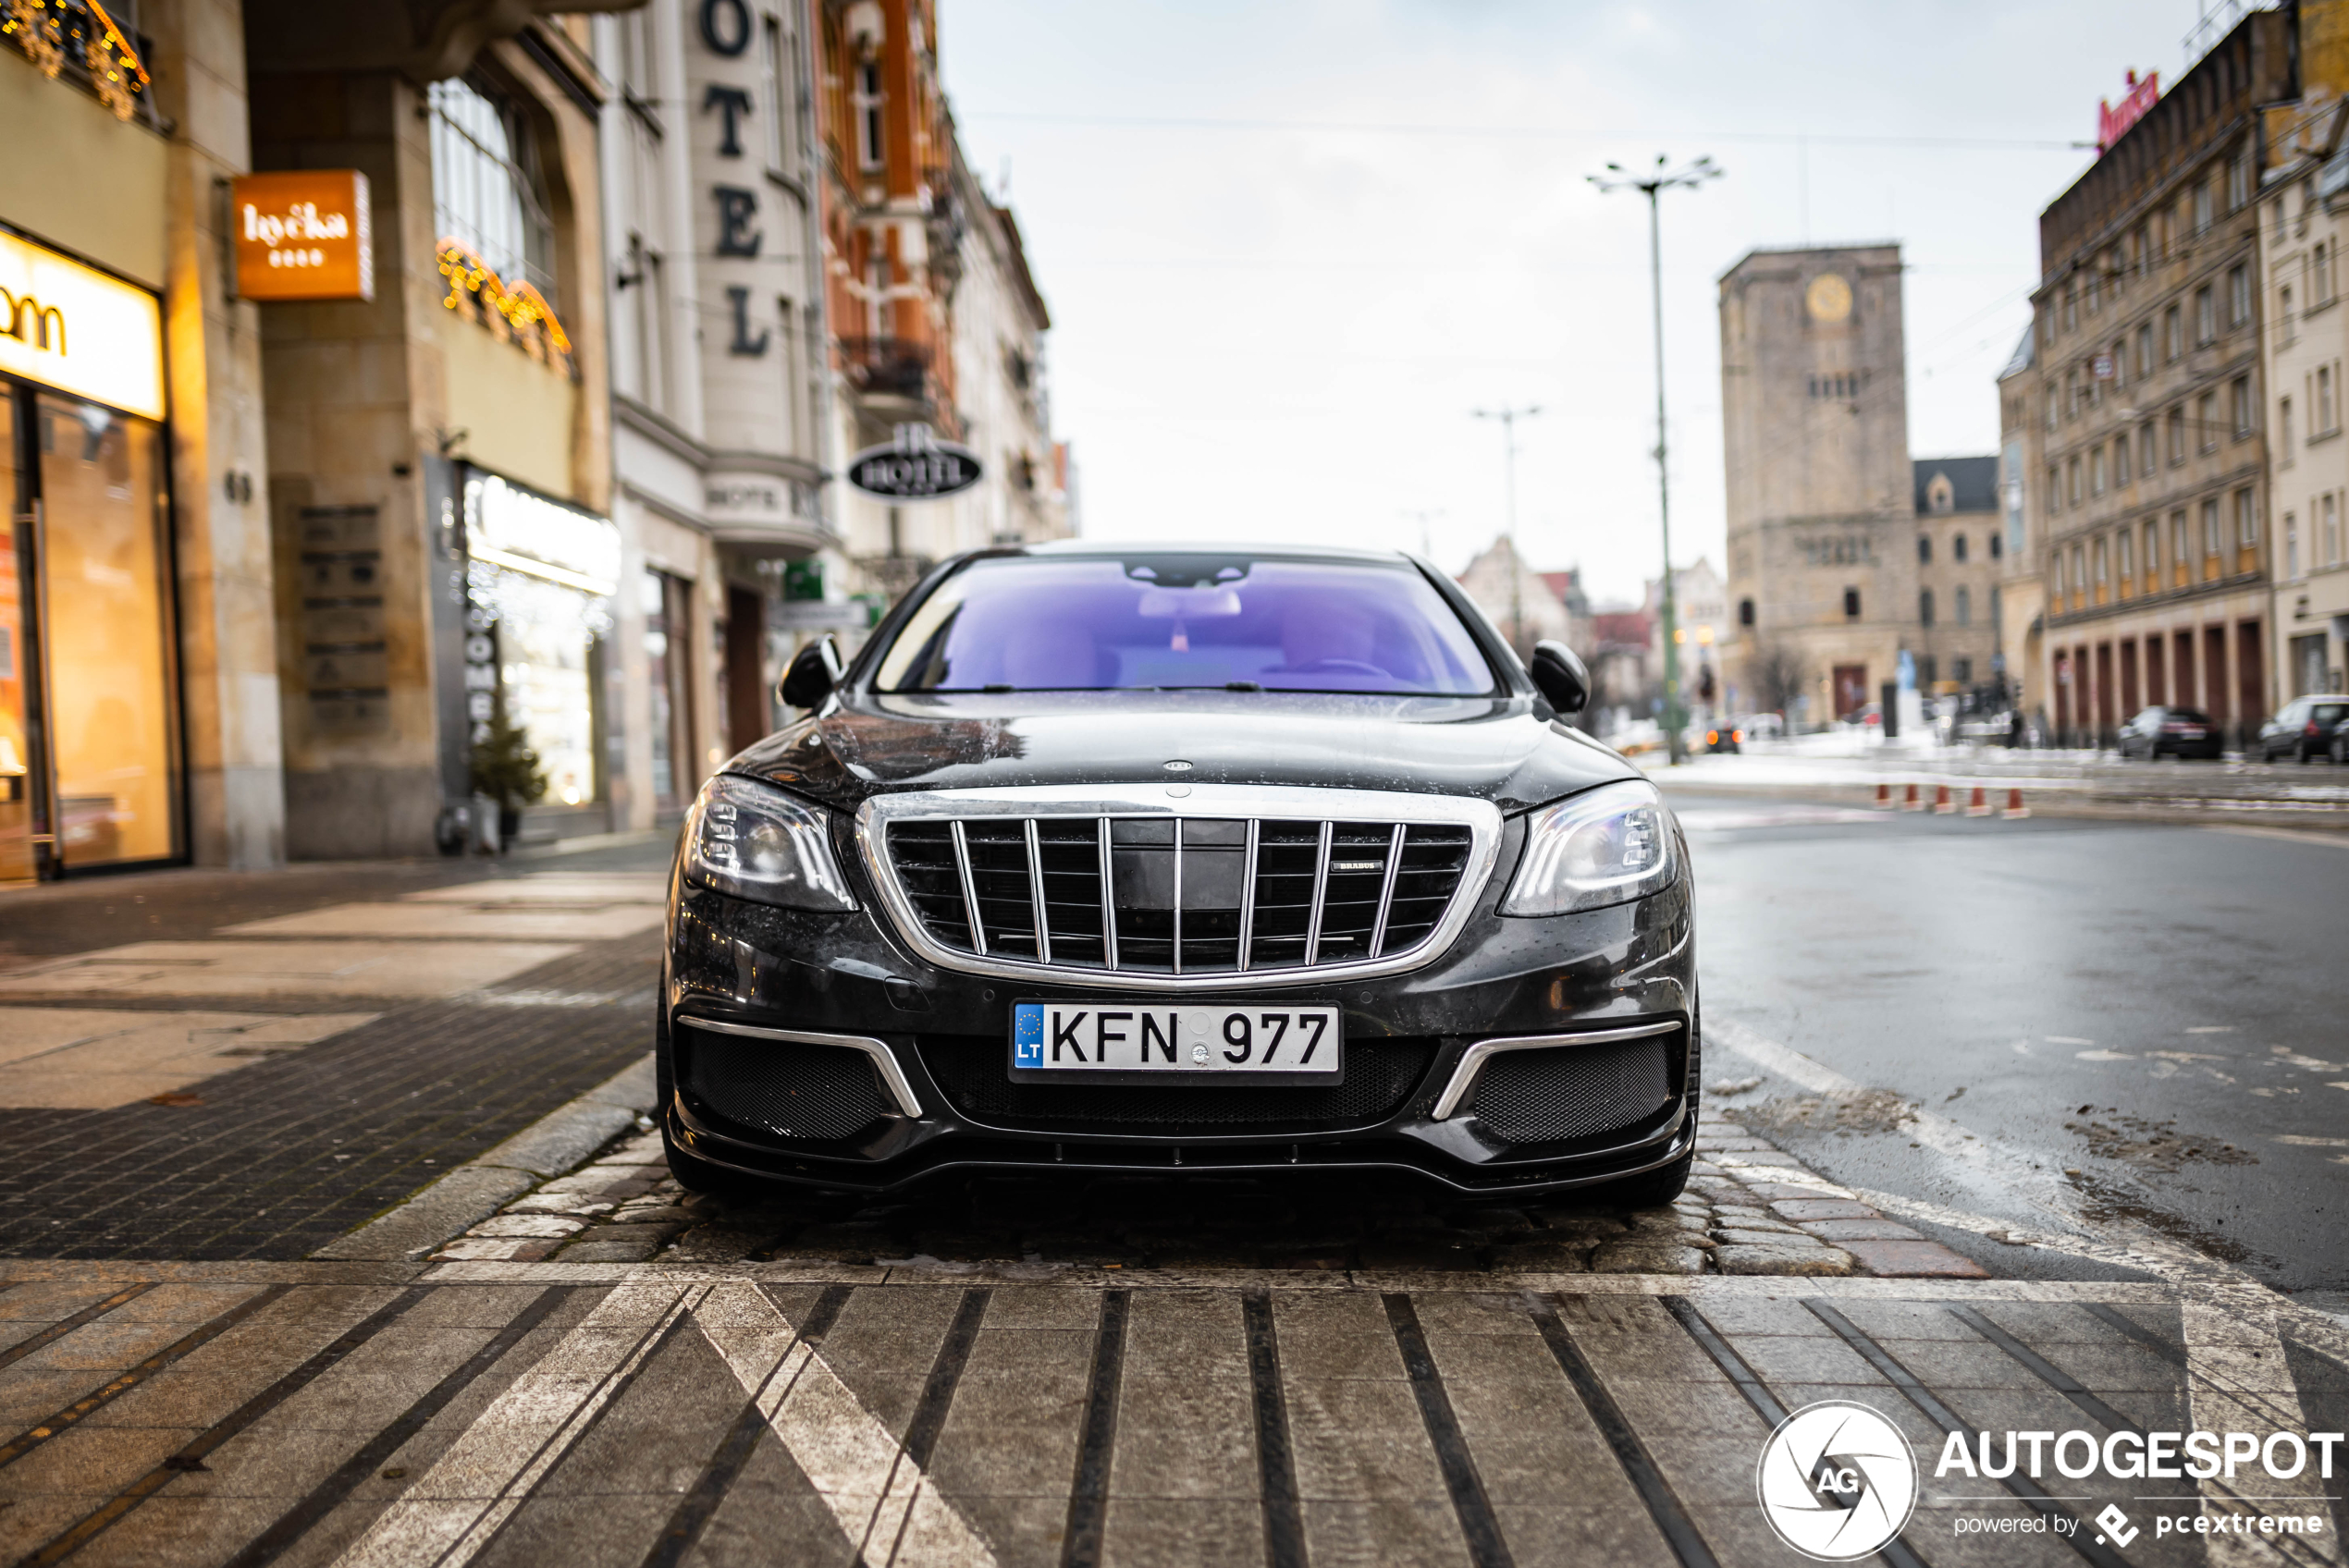 Mercedes-MaybachBrabus 900 Rocket 2018